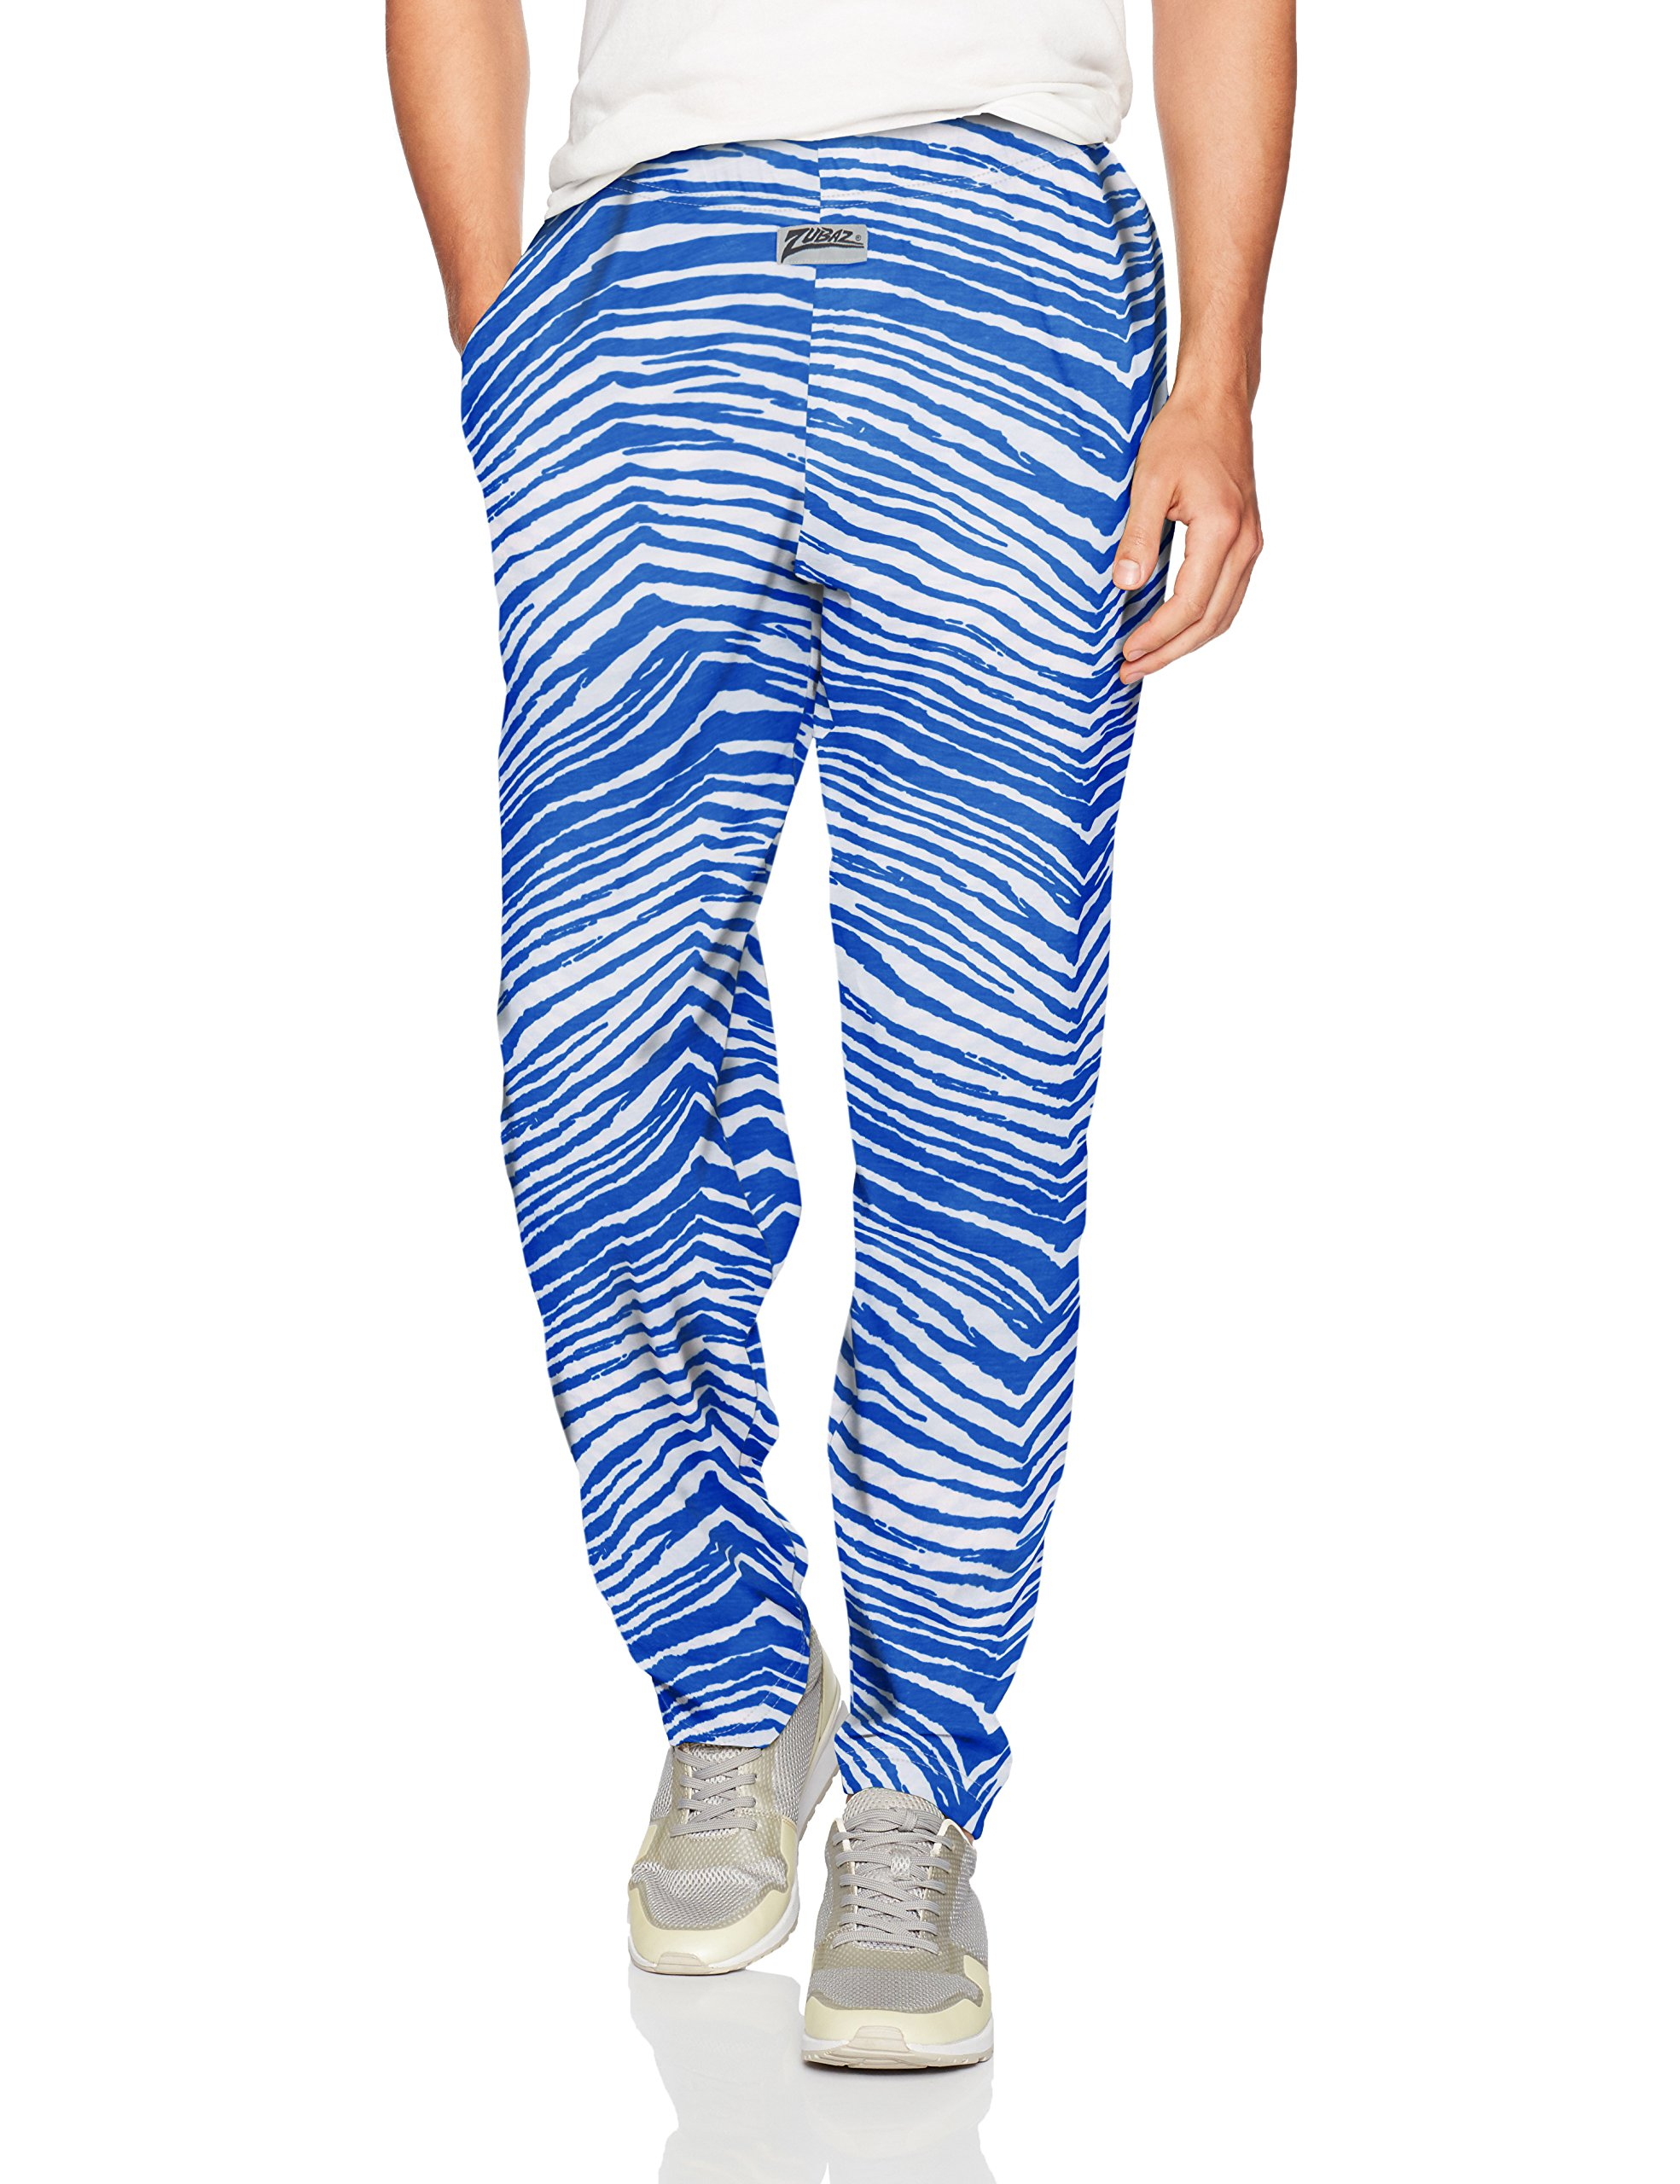 Zubaz Men's Classic Zebra Printed Athletic Lounge Pants, Royal Blue/White, L